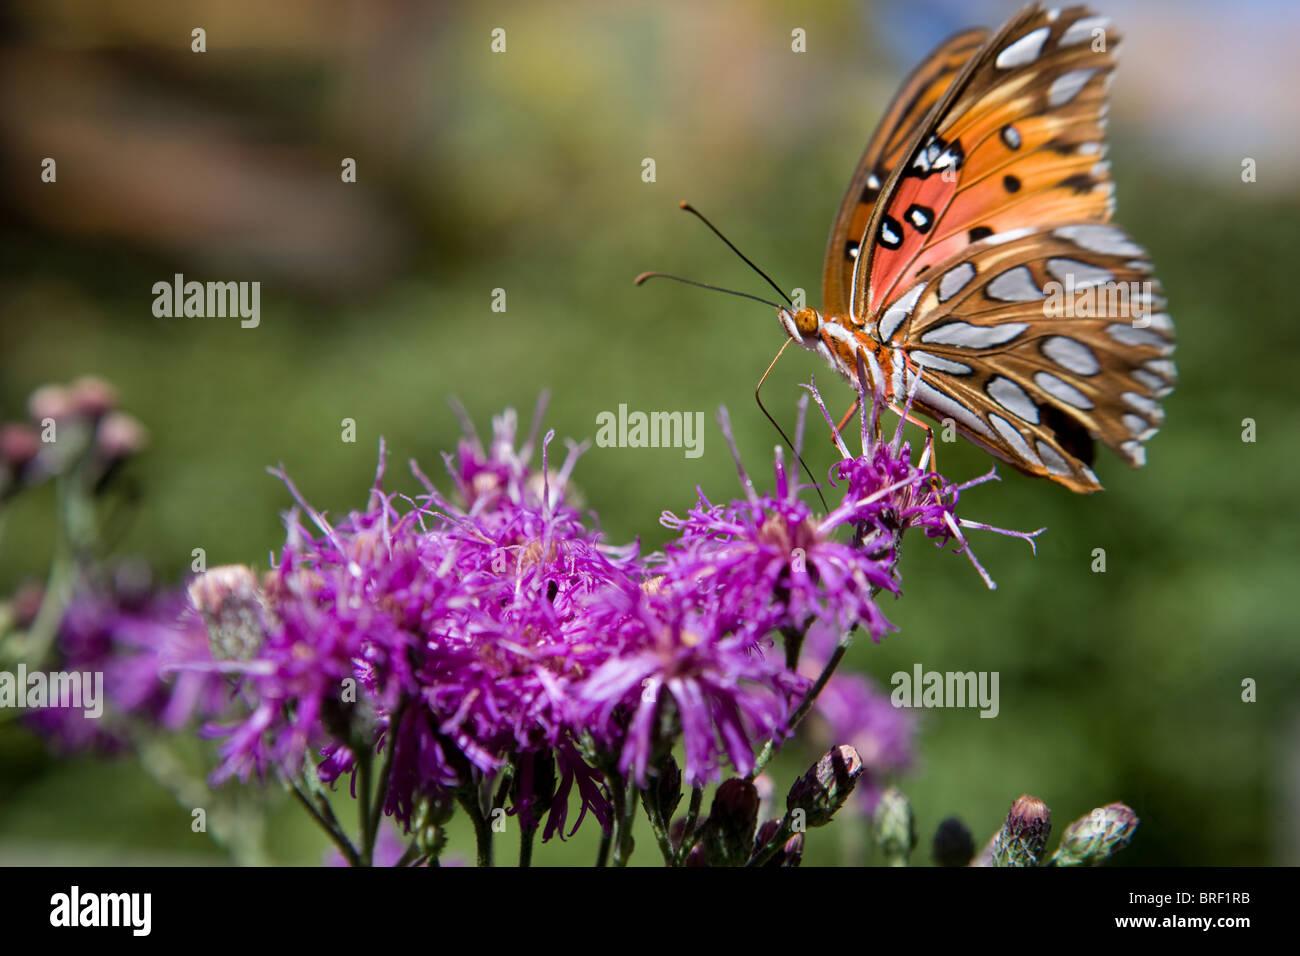 butterfly fluttering on a bright purple flower - Stock Image